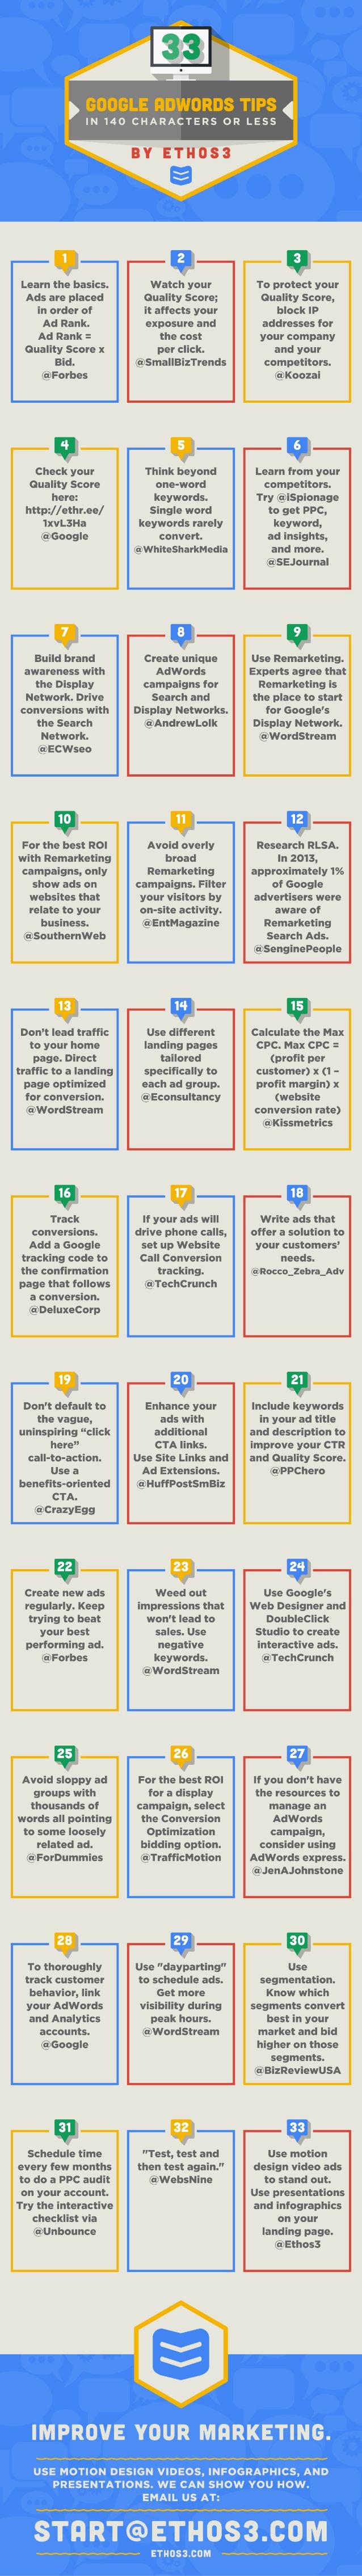 33 consejos sobre Google Adwords en 140 caracteres